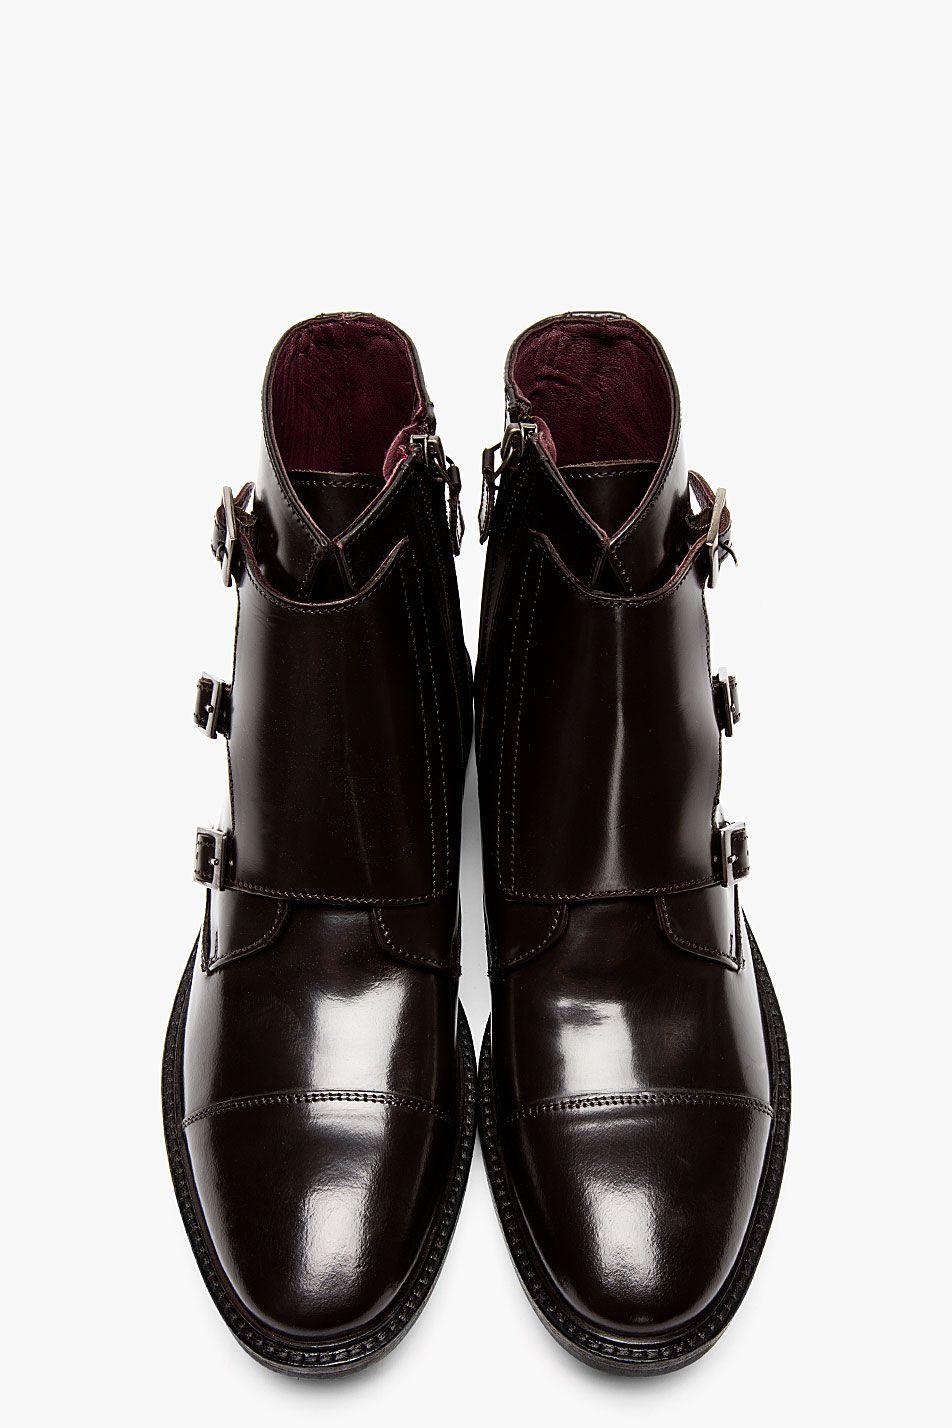 TIGER OF SWEDEN Deep brown monk strap CLIVE 04 boots